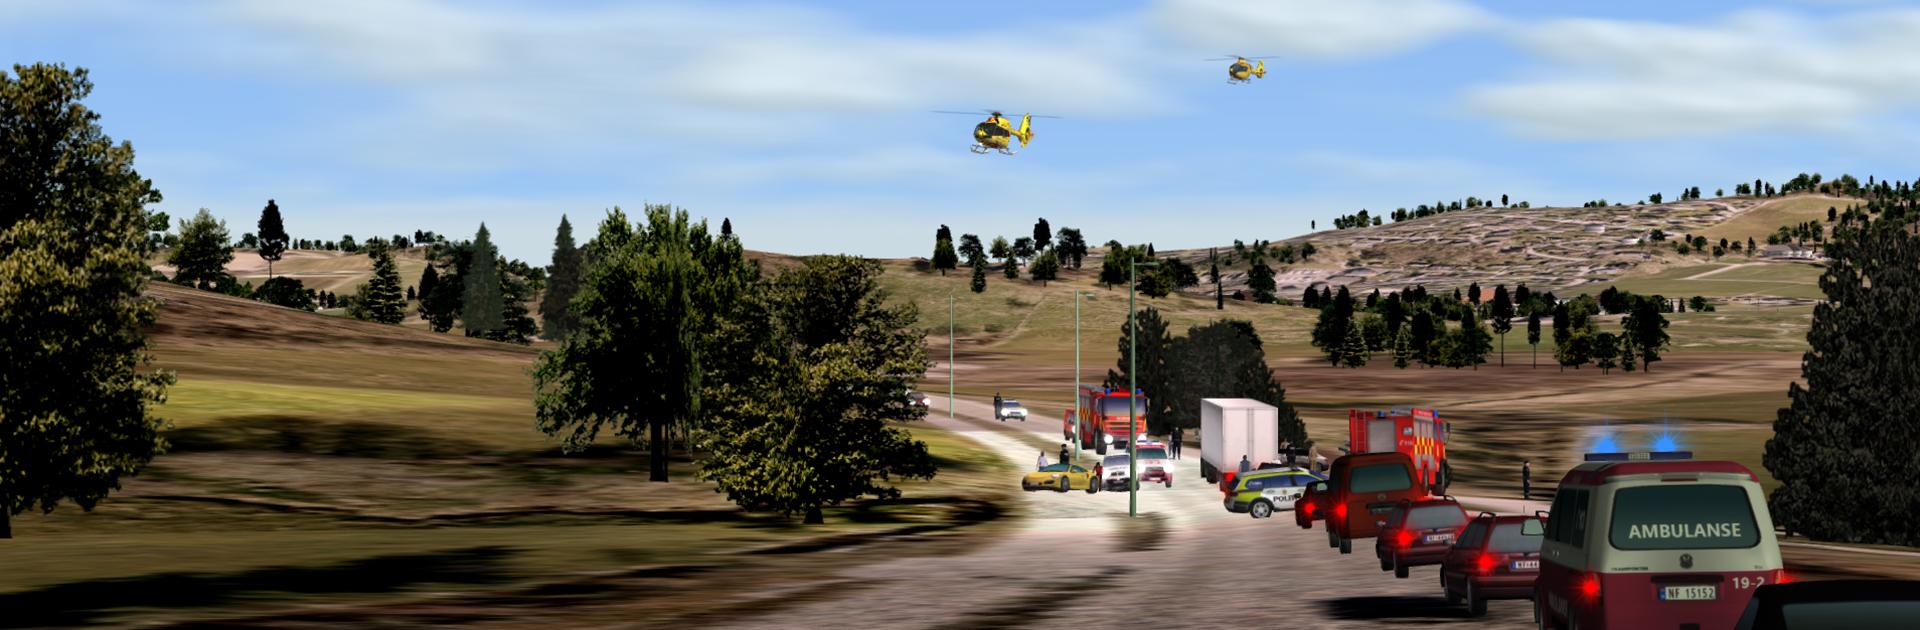 H145 Flight Simulator